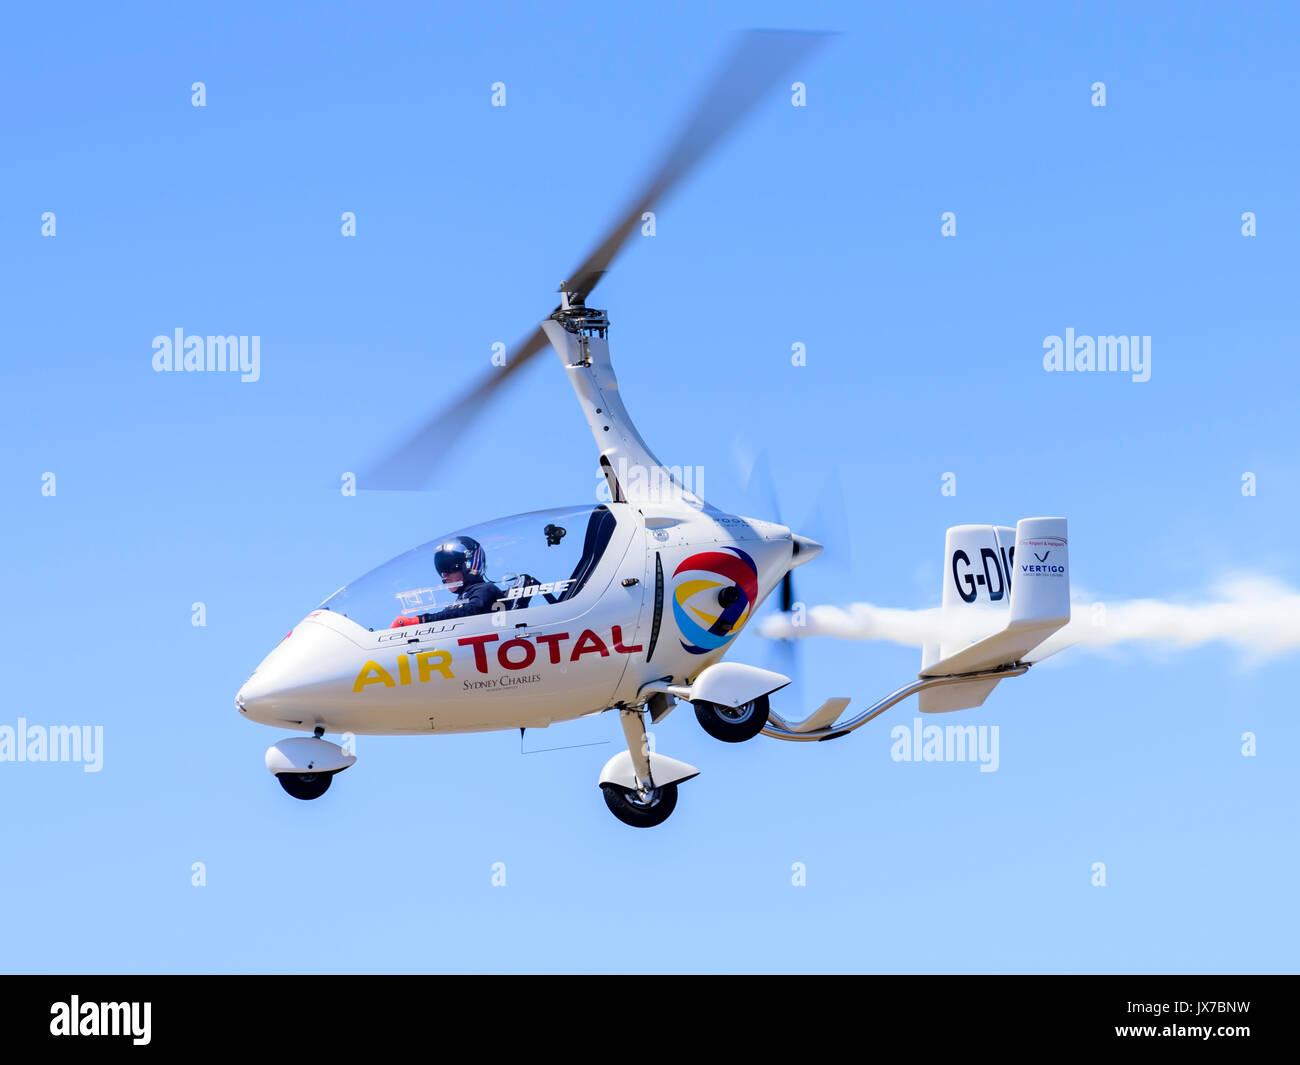 Peter Davies flying the Gyro Air Displays RotorSport Calidus